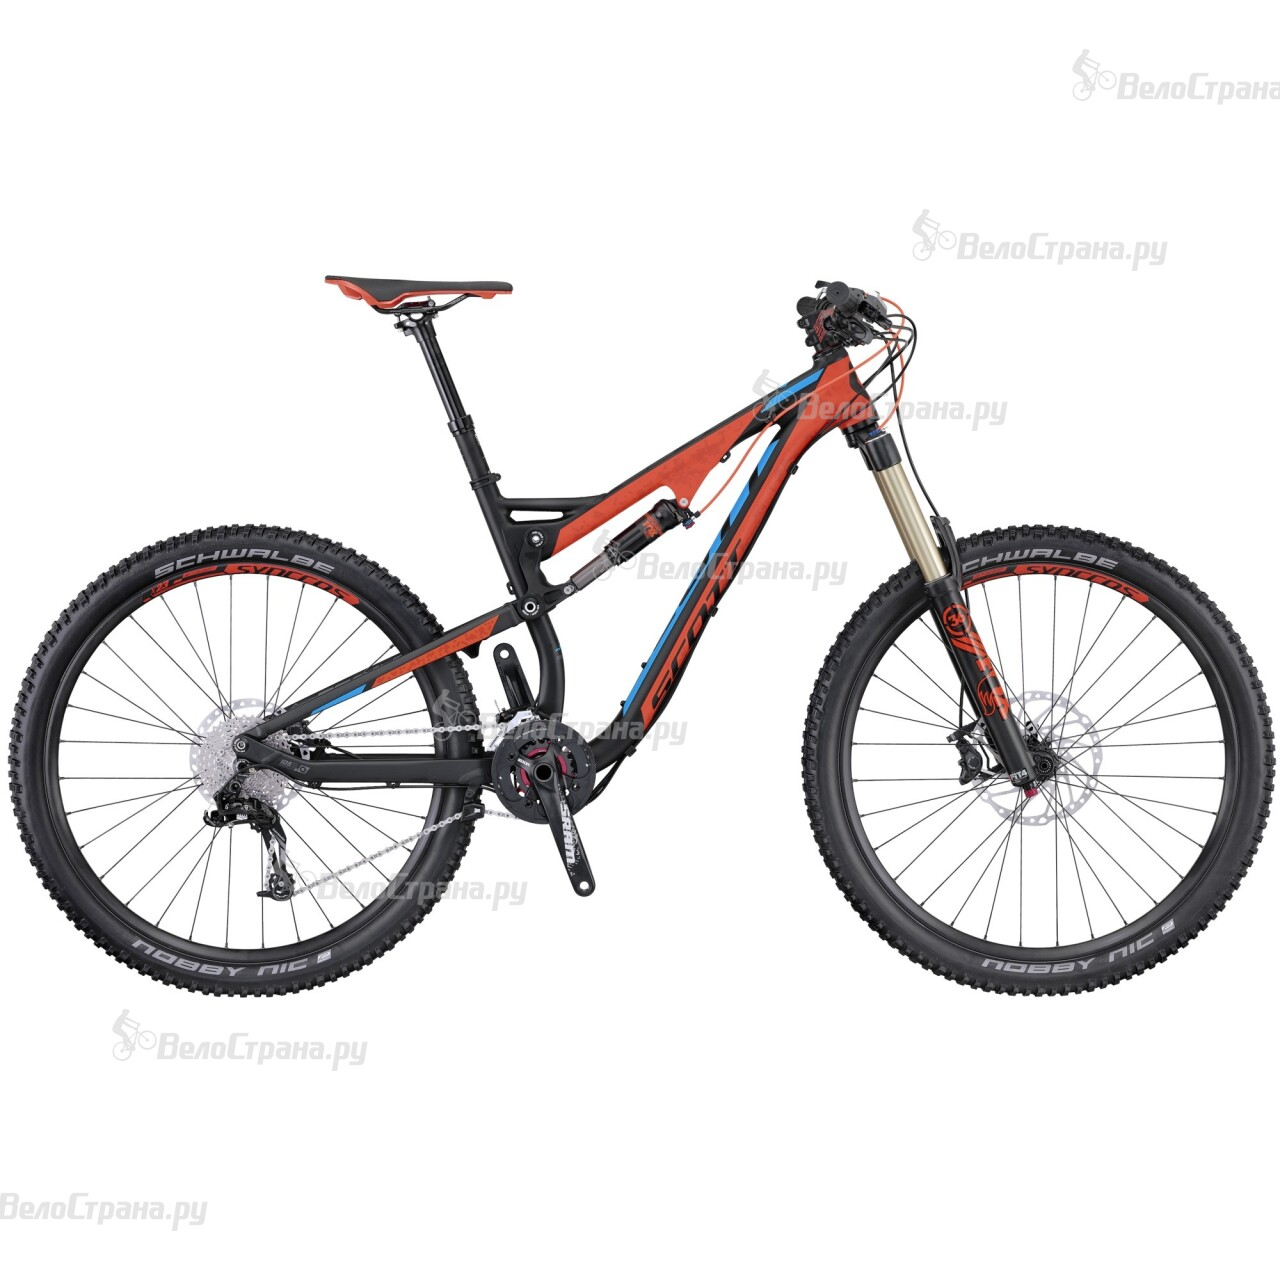 Велосипед Scott Genius LT 720 (2016) велосипед scott genius lt 720 2015